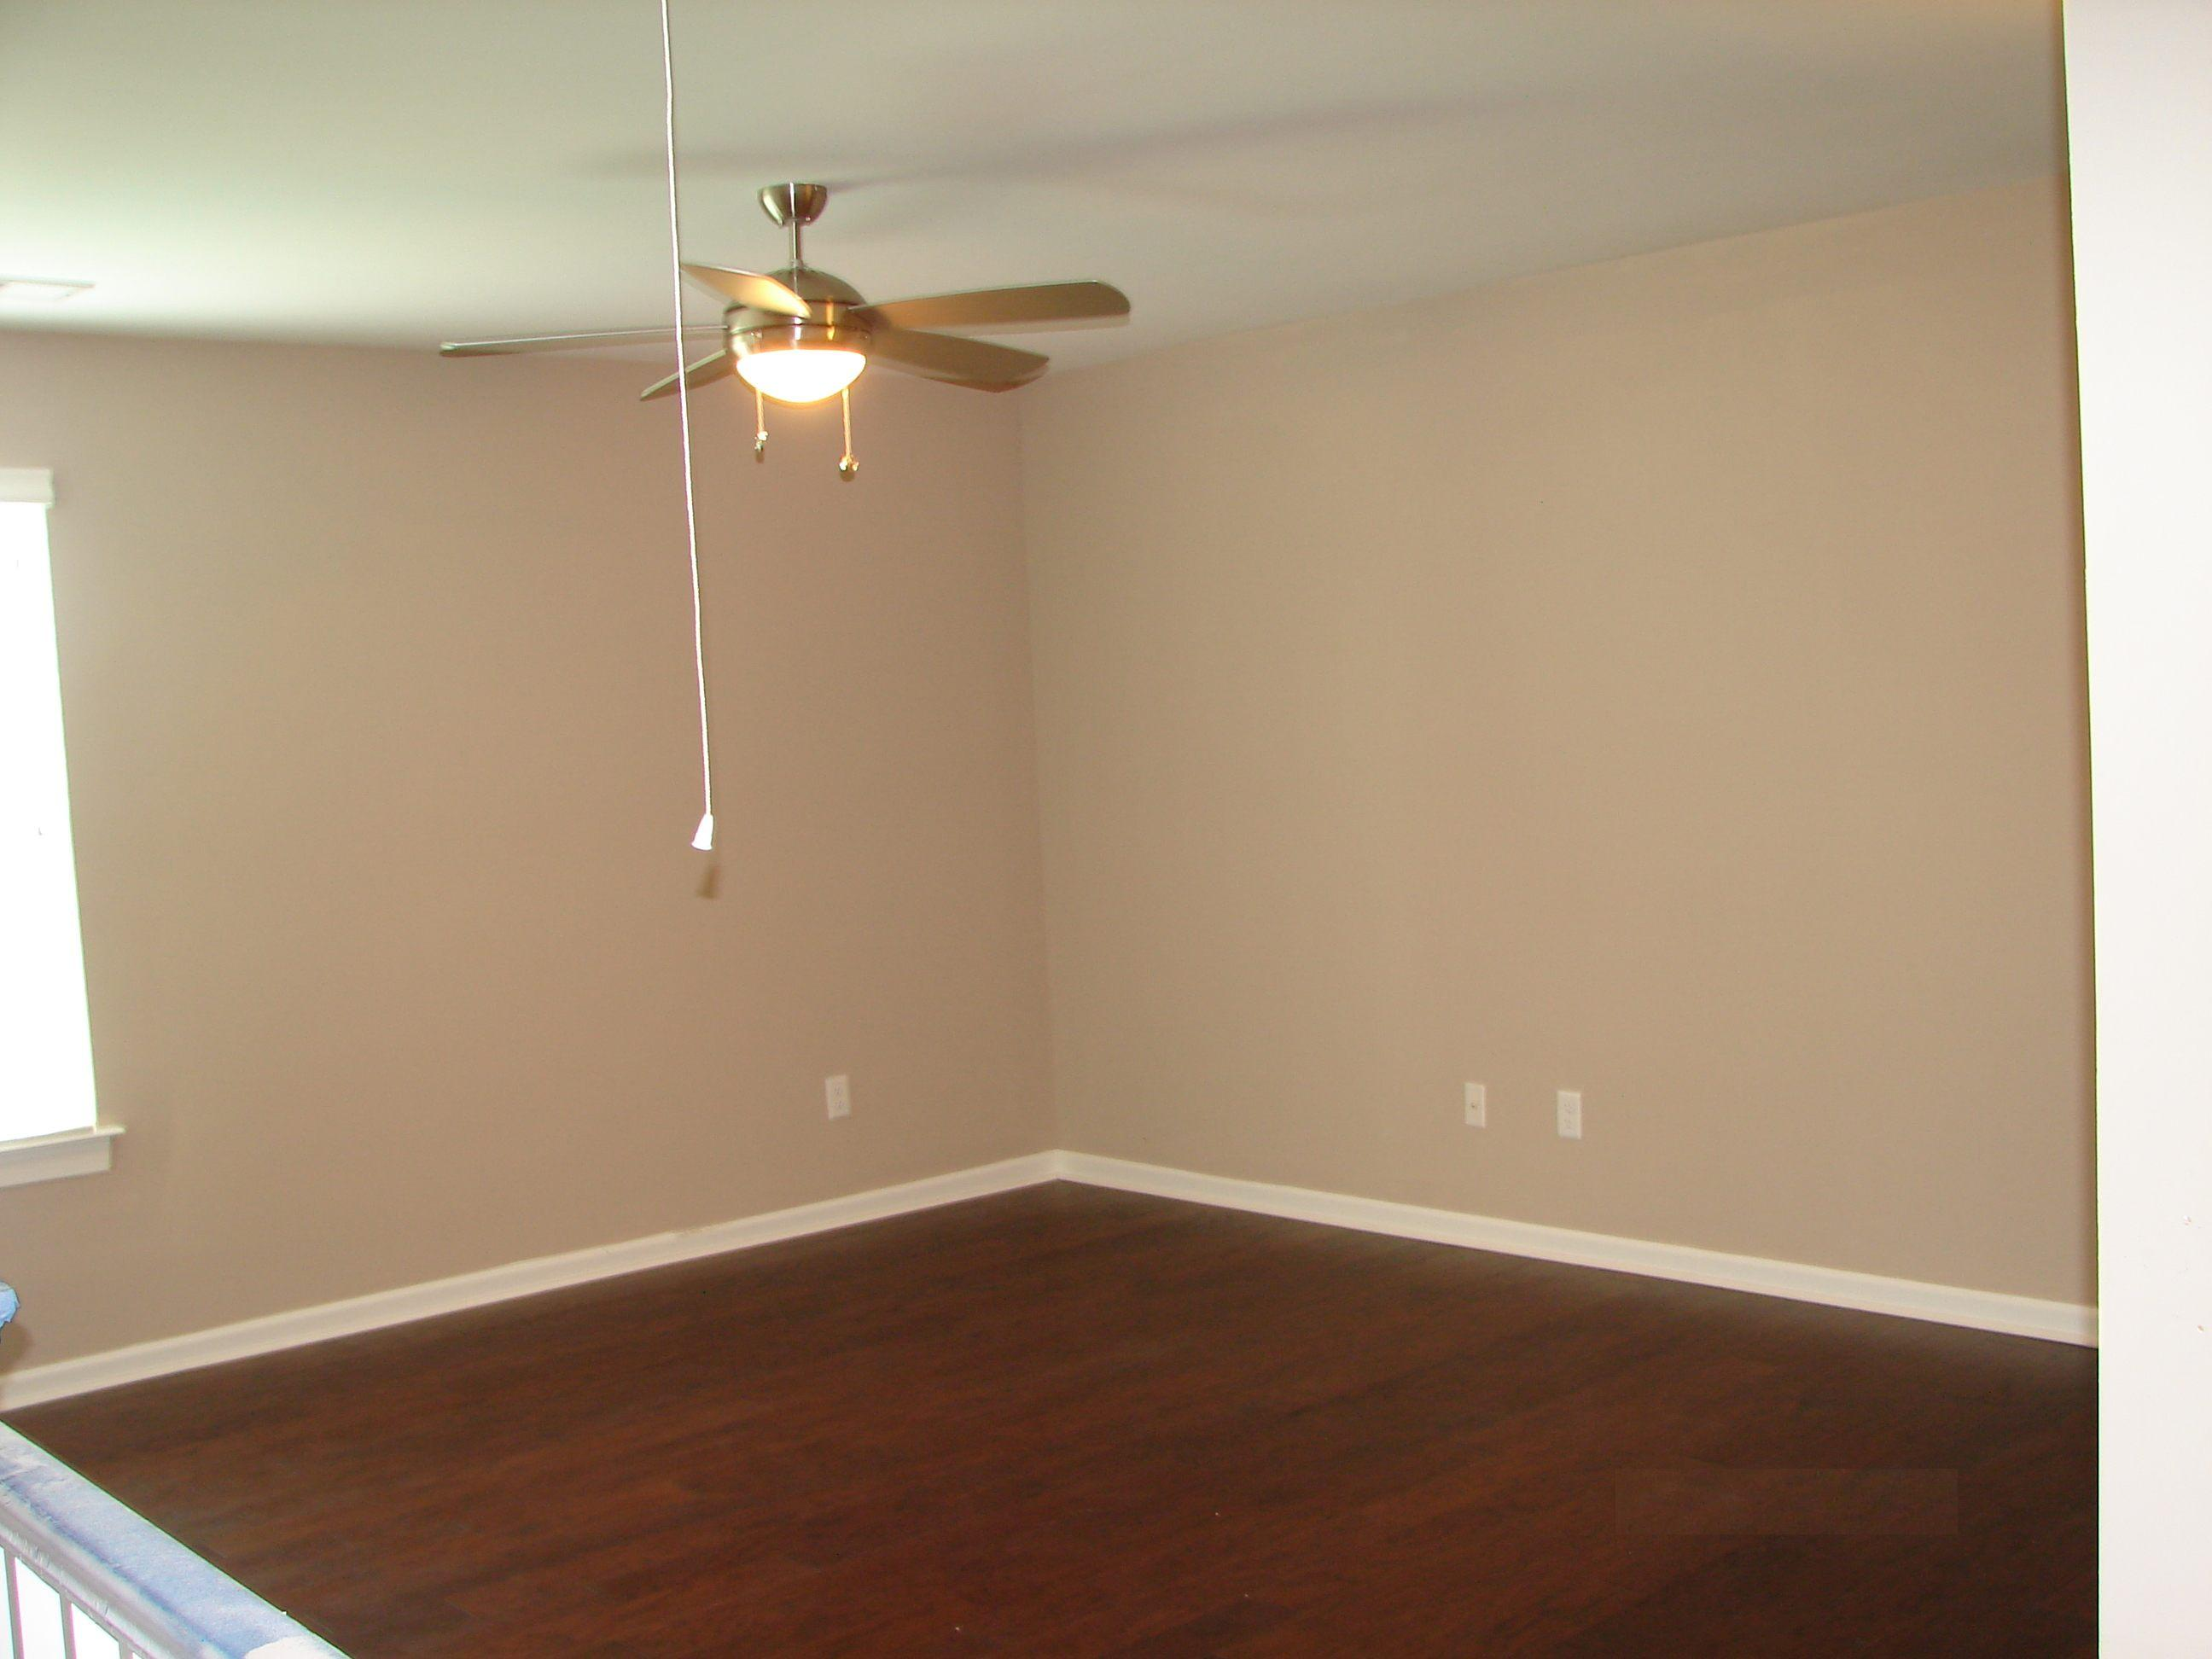 Filbin Creek Homes For Sale - 1173 Sumner, North Charleston, SC - 9